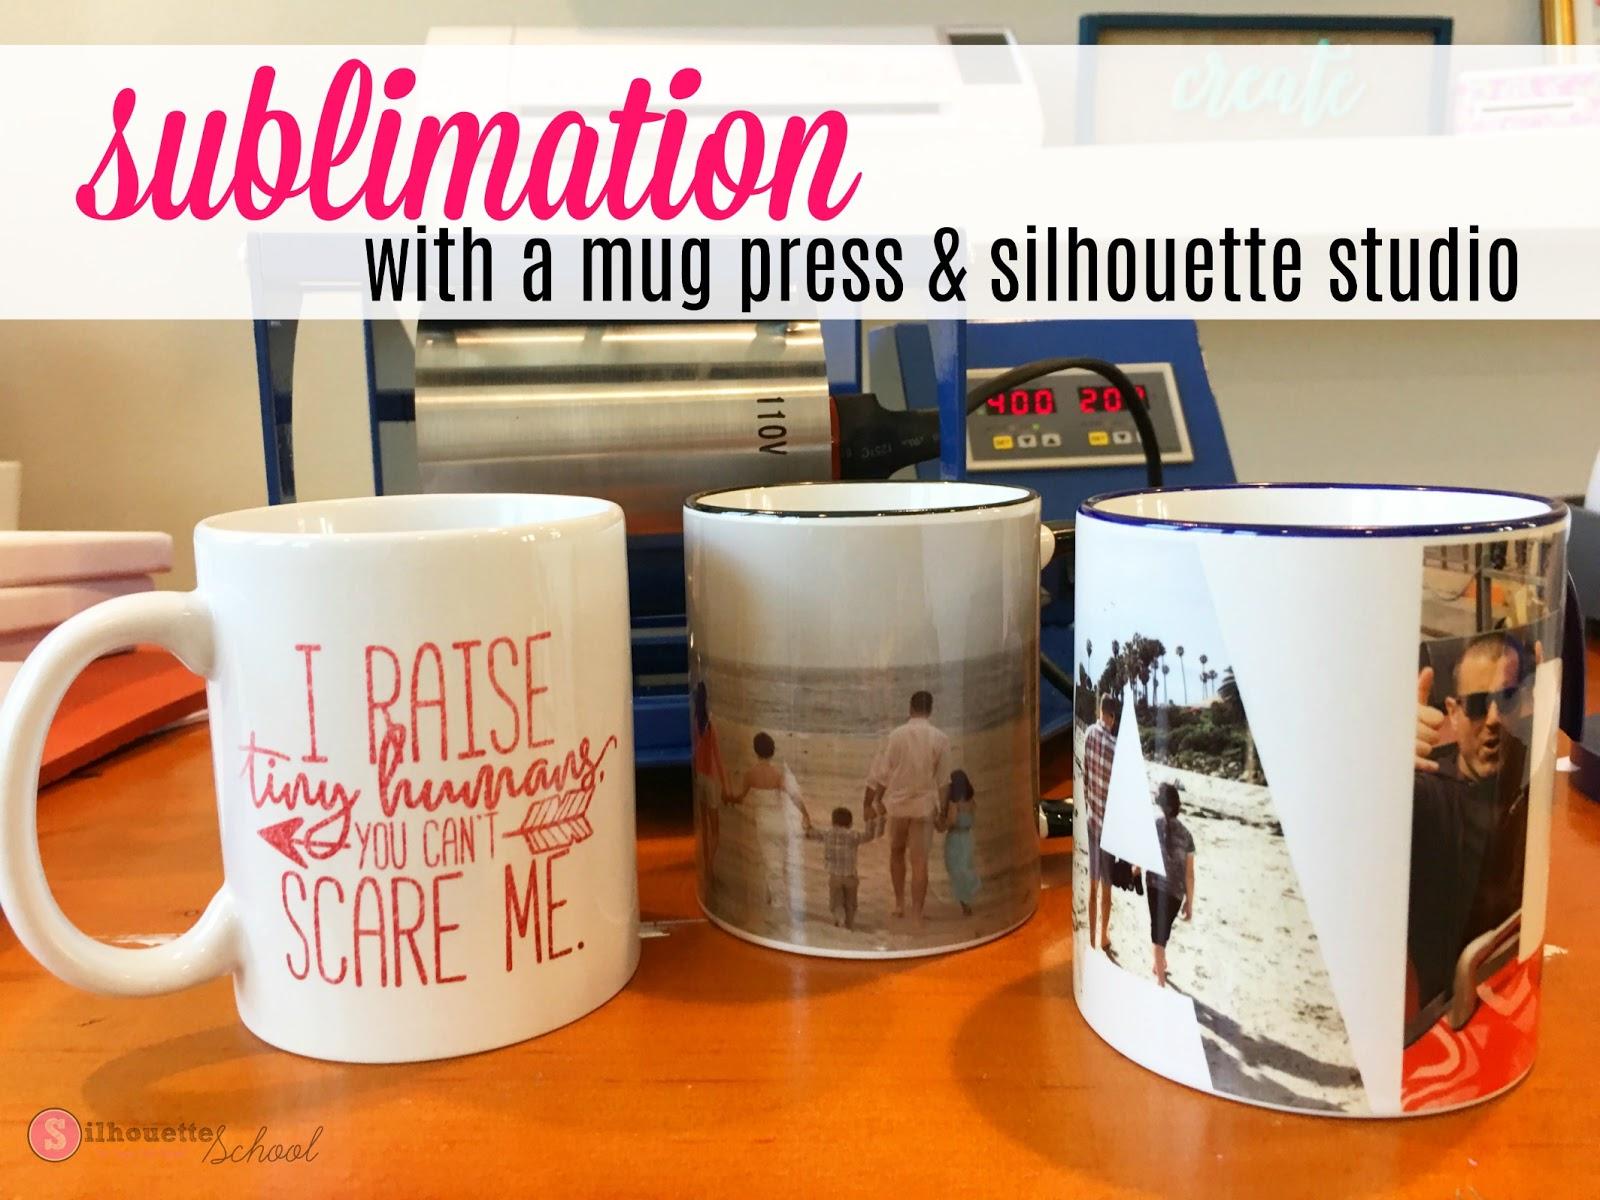 How To Sublimate Onto Ceramic Mugs Using Silhouette Studio